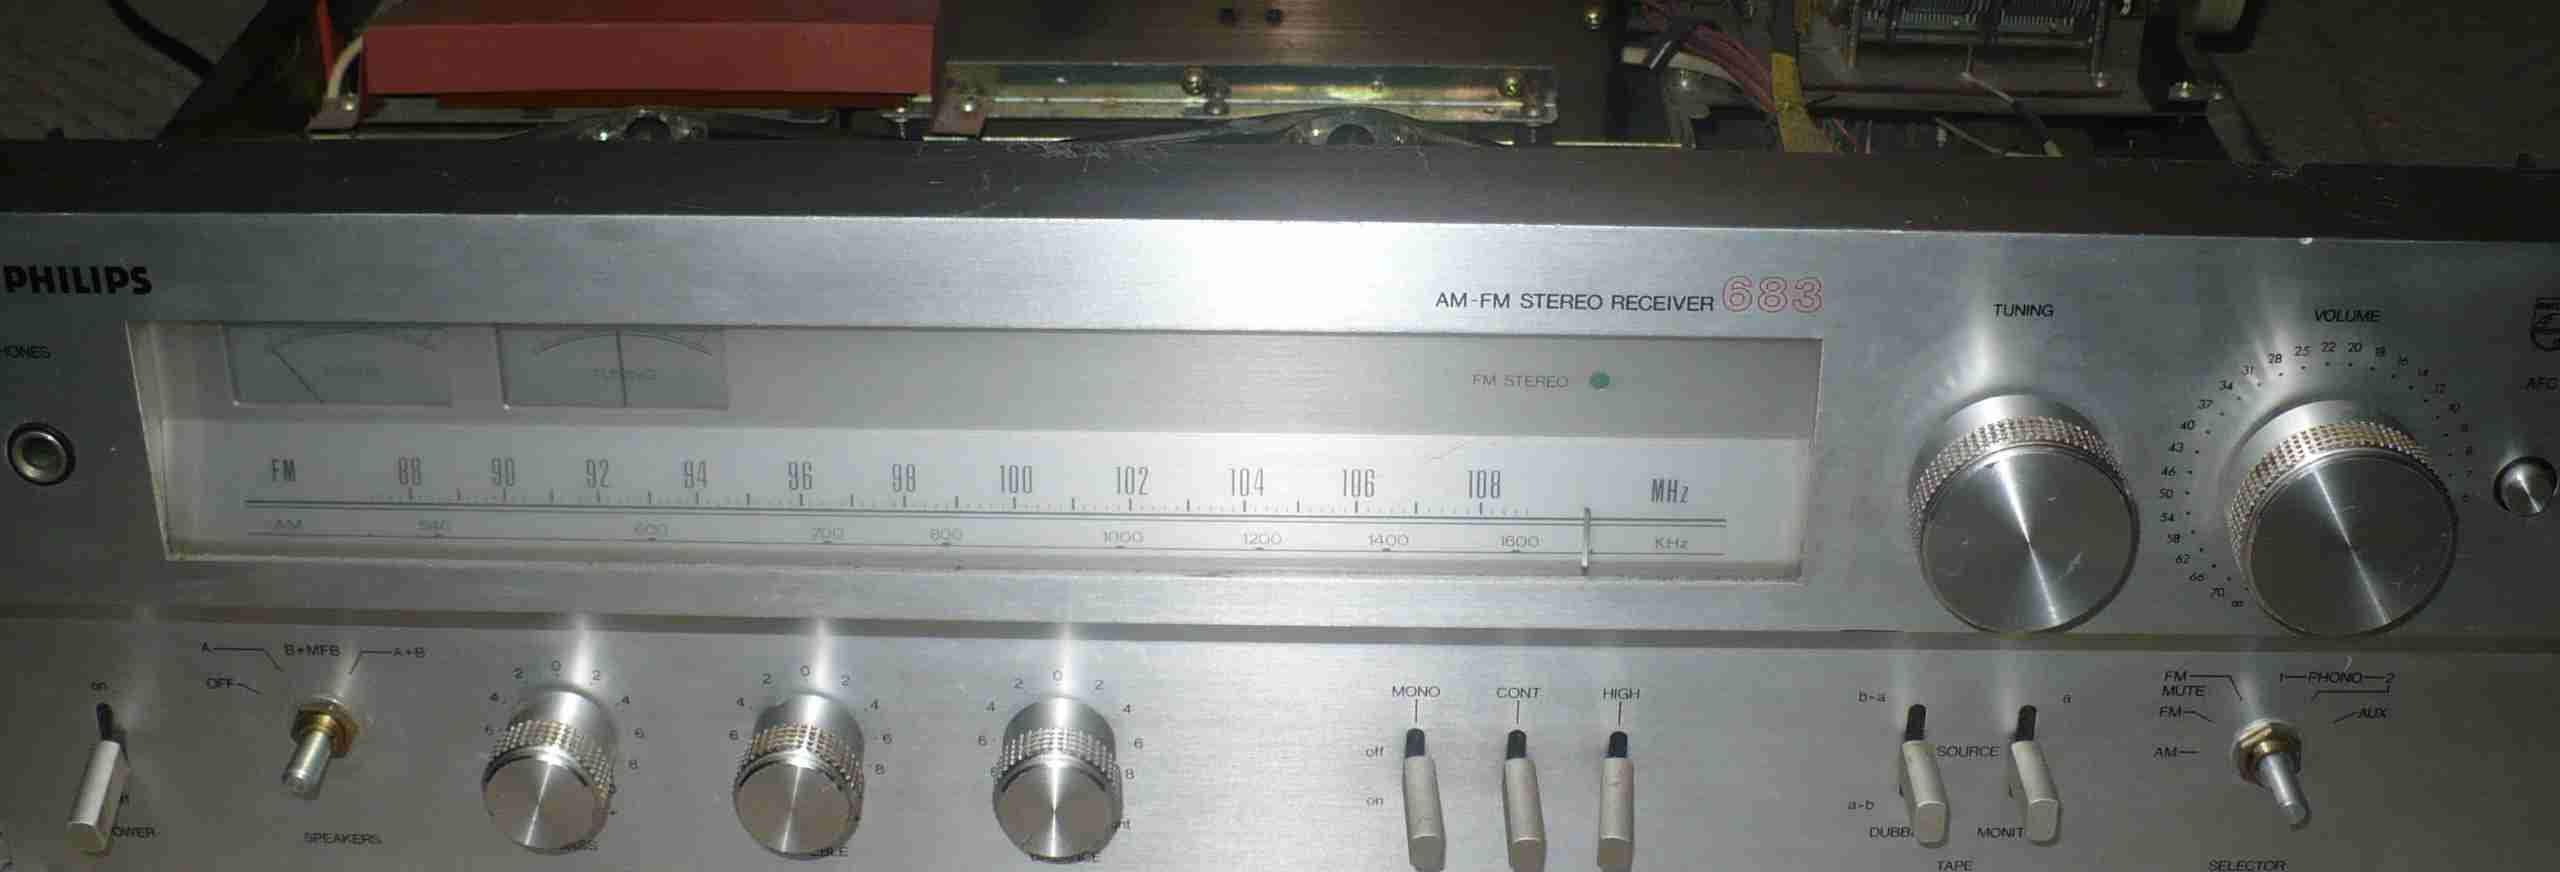 Philips (22)AH 683 - Pad� przeka�nik i/lub ko�c�wka mocy